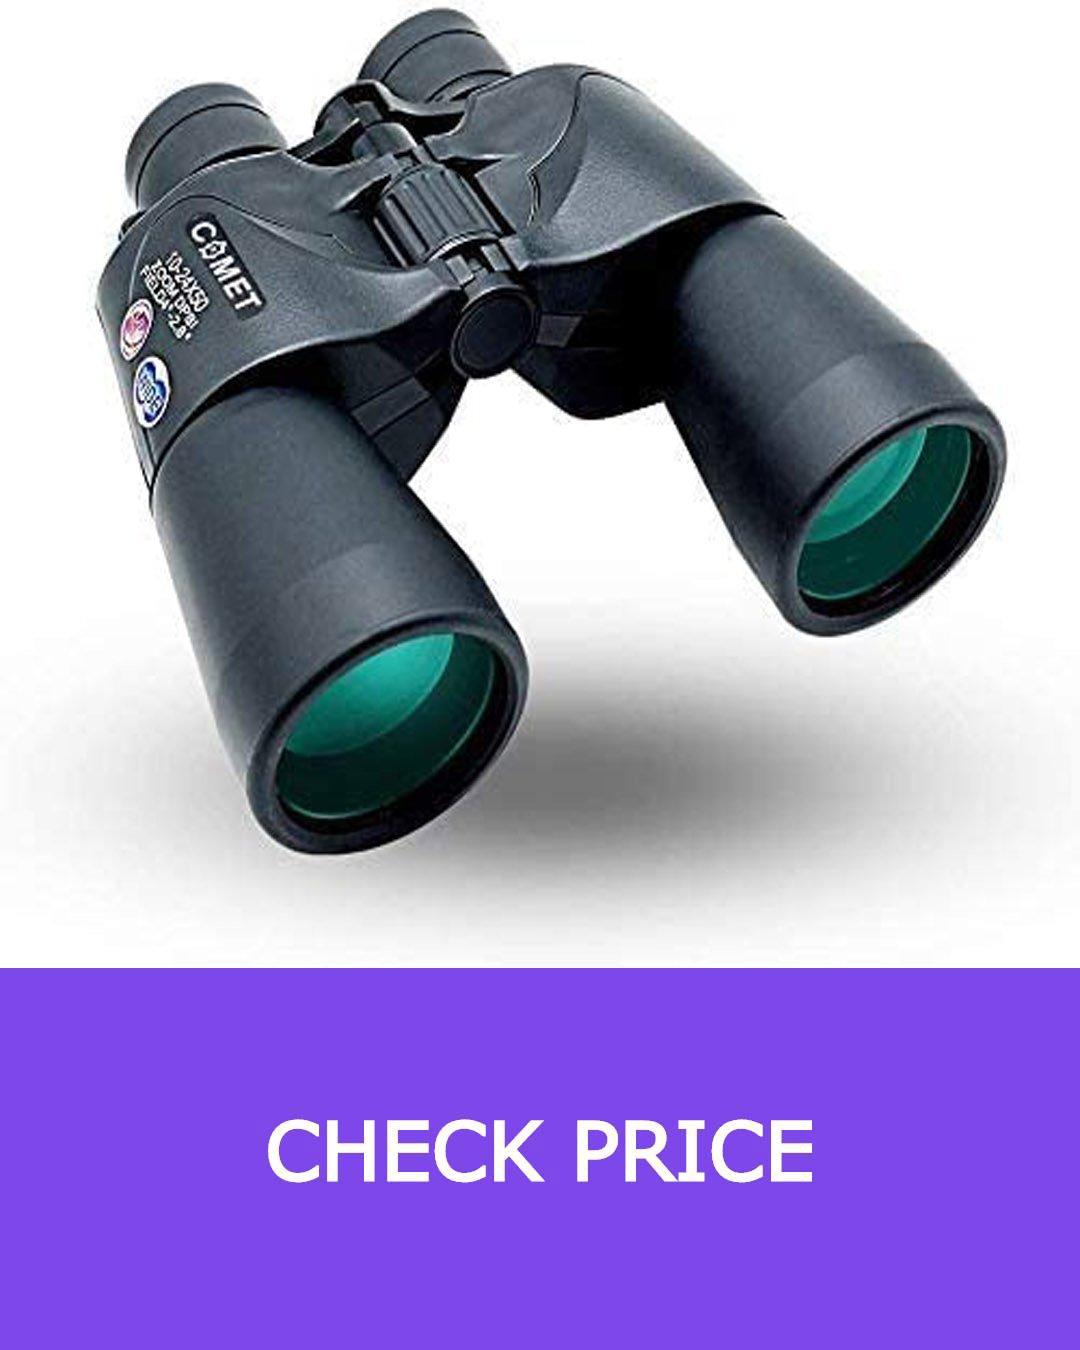 AMRTI Binoculars